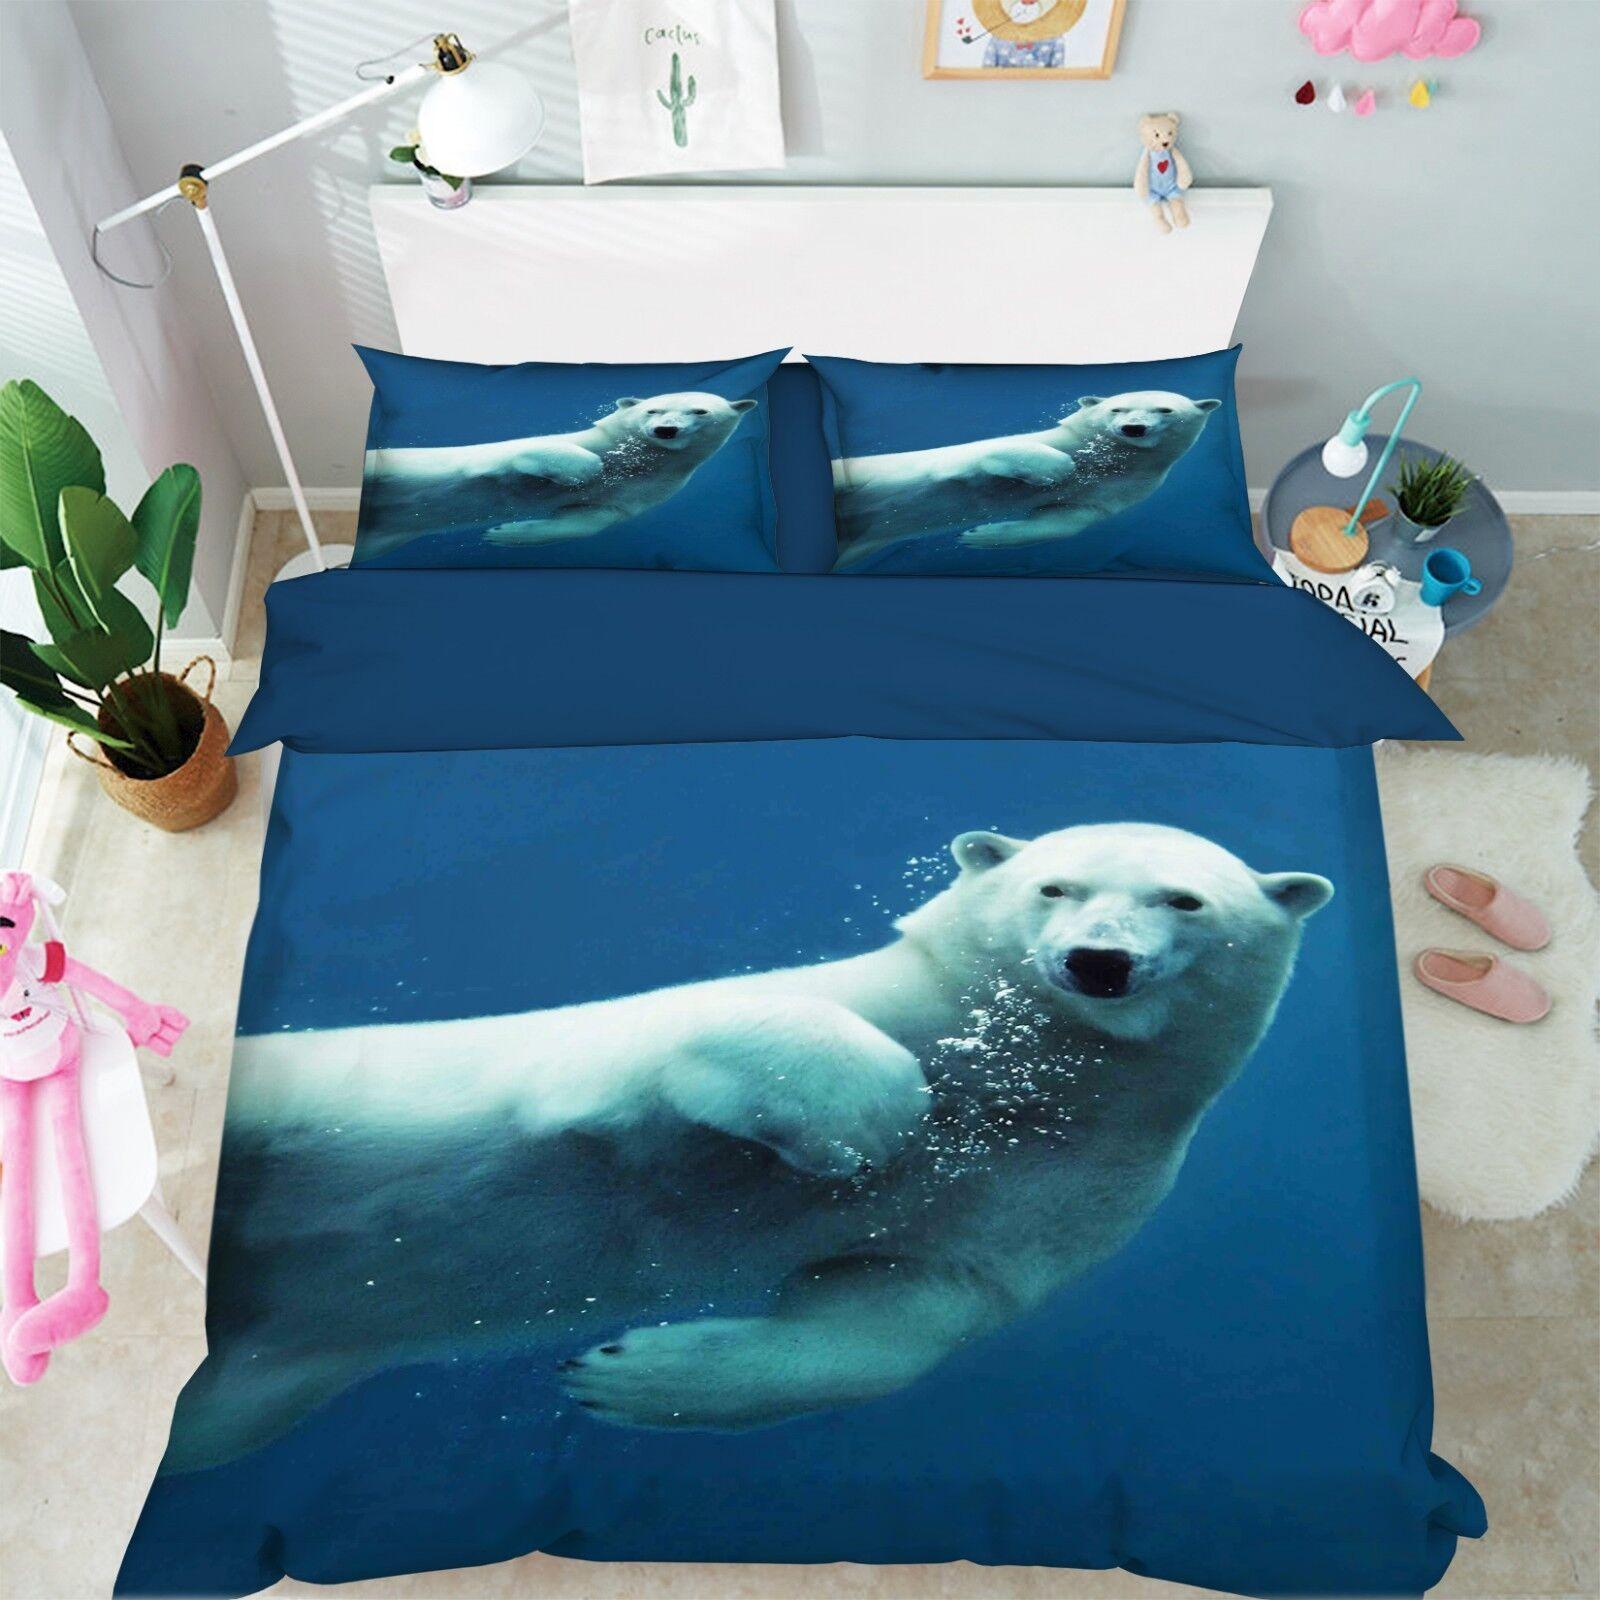 3D Polar Bear Sea 899 lit PilFaiblecass courtepointe couette Cover Set Single Queen roi CA